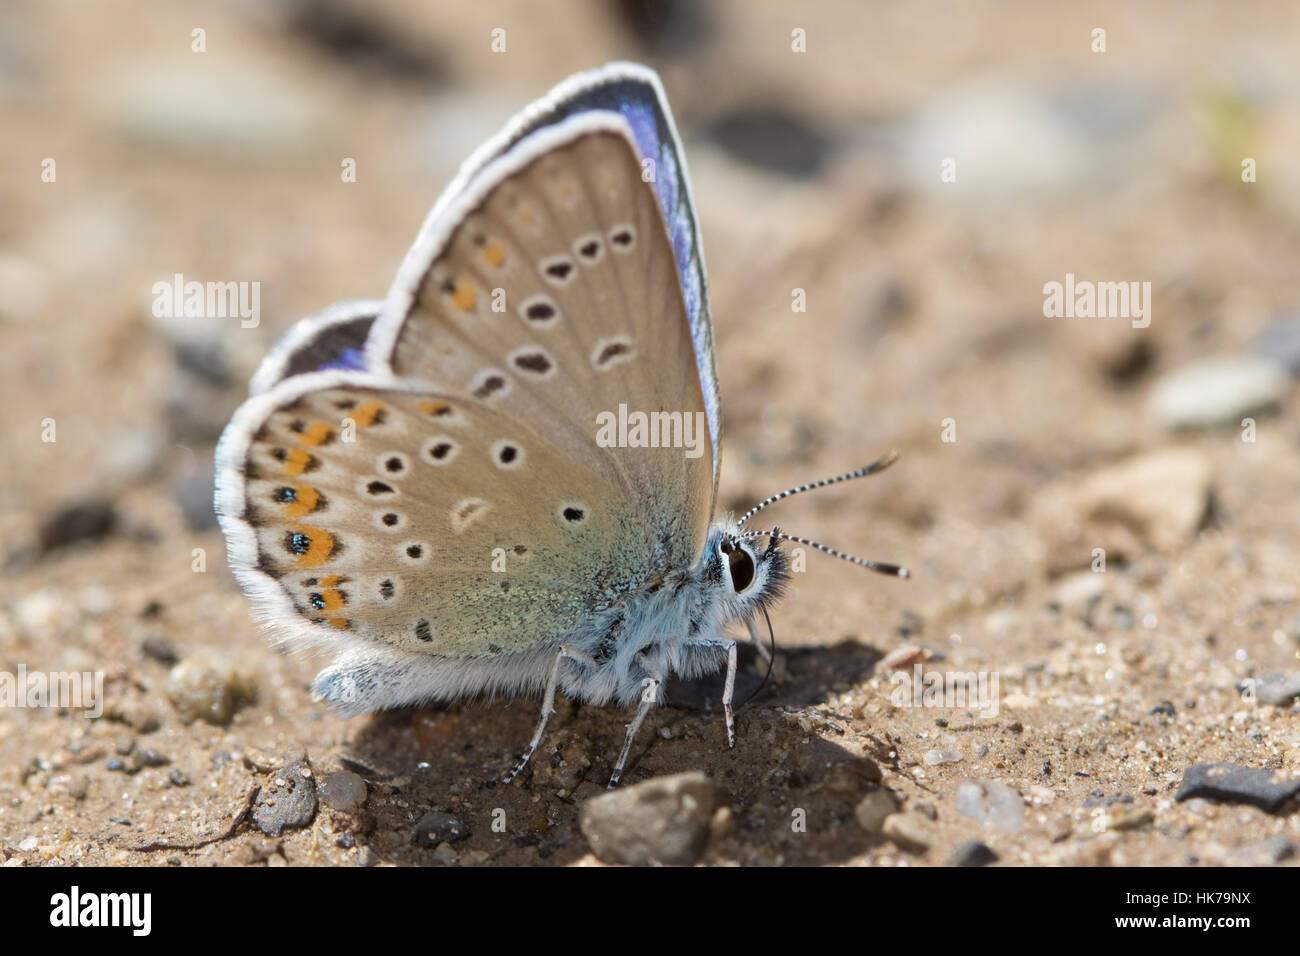 Idas Blue (Plebejus idas) butterfly feeding on minerals from damp soil - Stock Image